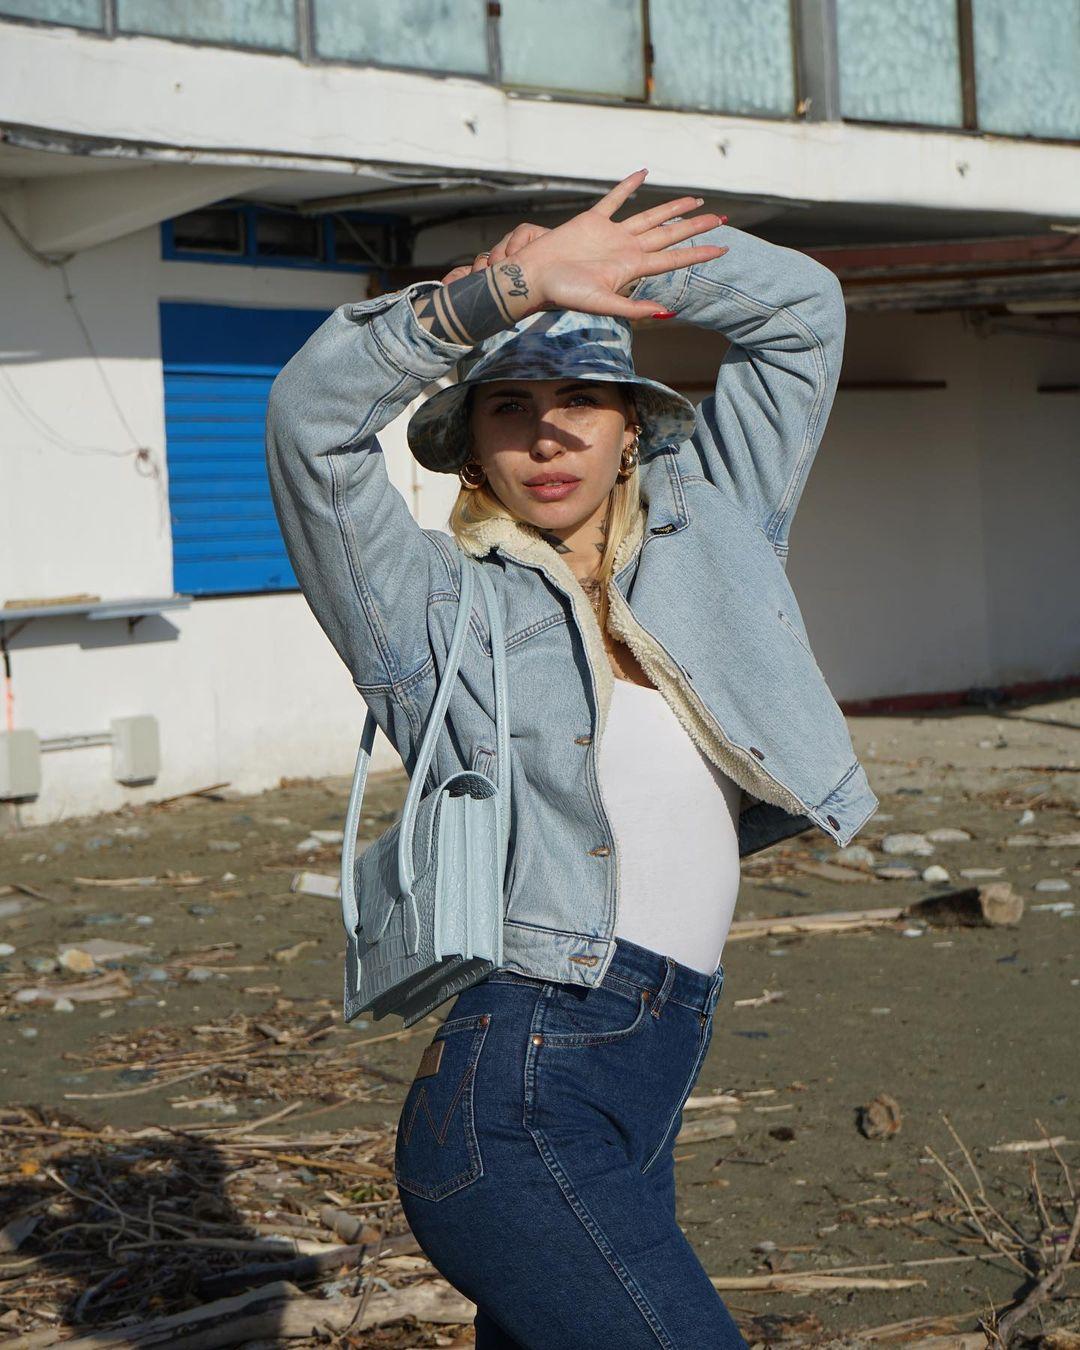 Ludovica-Melisurgo-Wallpapers-Insta-Fit-BIo-4